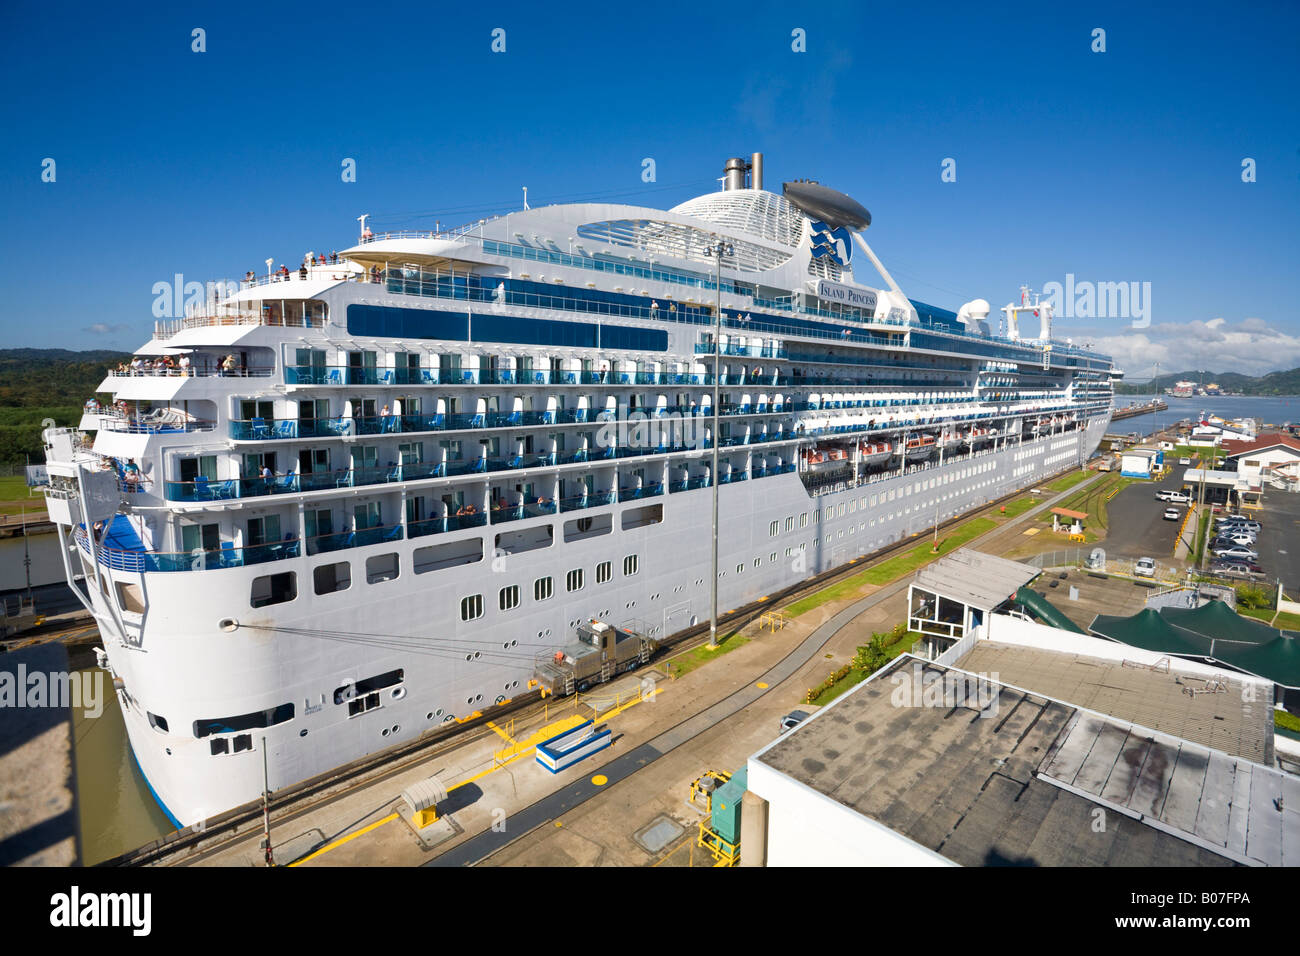 Panama Panama Canal Island Princess Cruise Ship